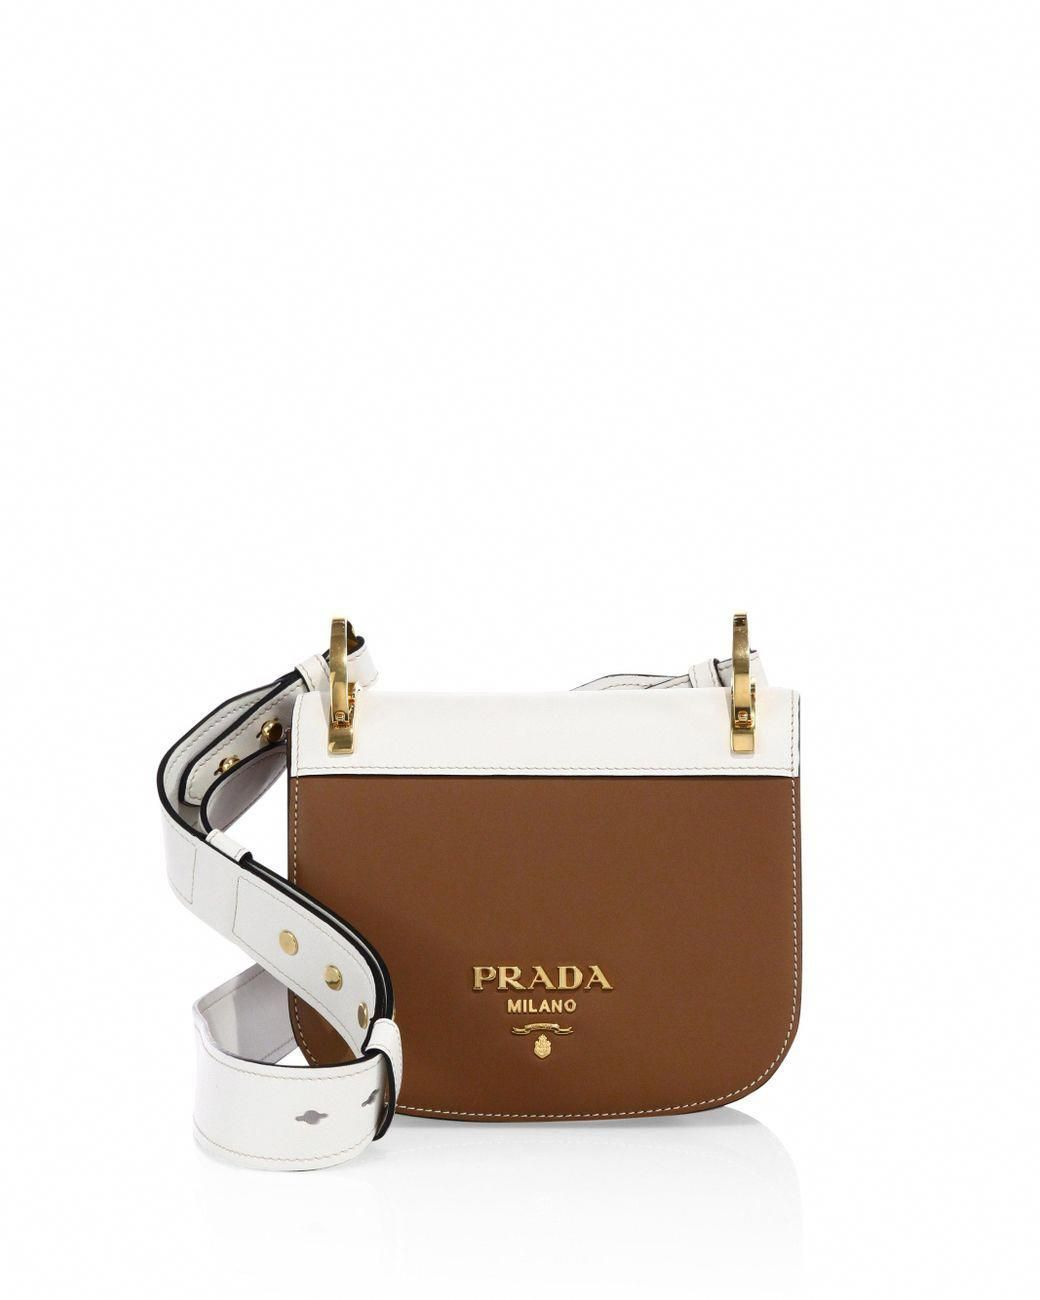 32c2200145ba Prada - Brown Pionniere Leather Saddle Bag - Lyst #Pradahandbags  #leathersaddlebagpurse #crossbodysaddlebag